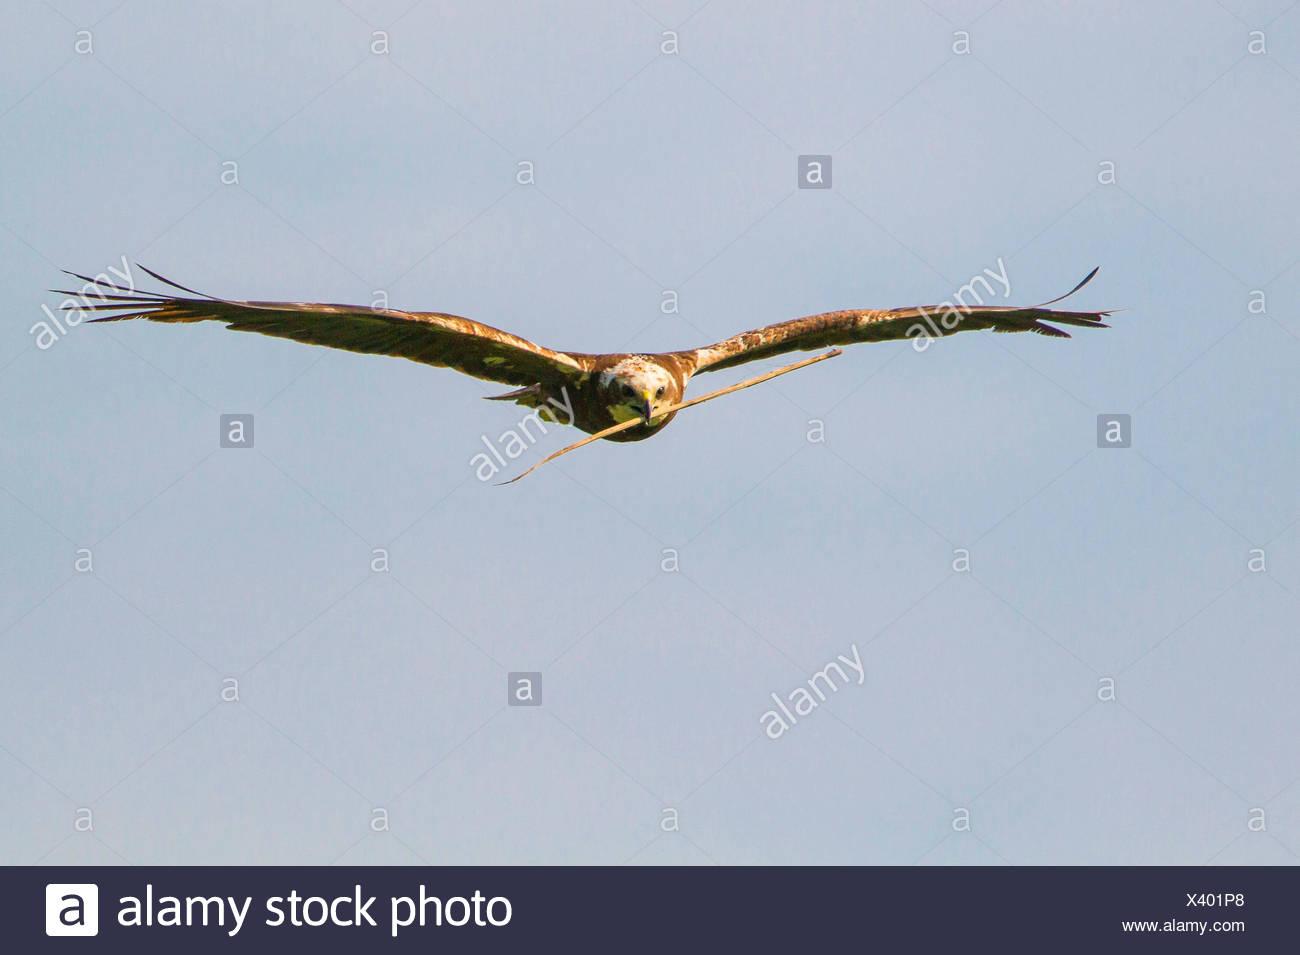 Western Marsh Harrier (Circus aeruginosus), female flying with nesting material in the bill, Germany, Bavaria, Oberbayern, Upper Bavaria - Stock Image